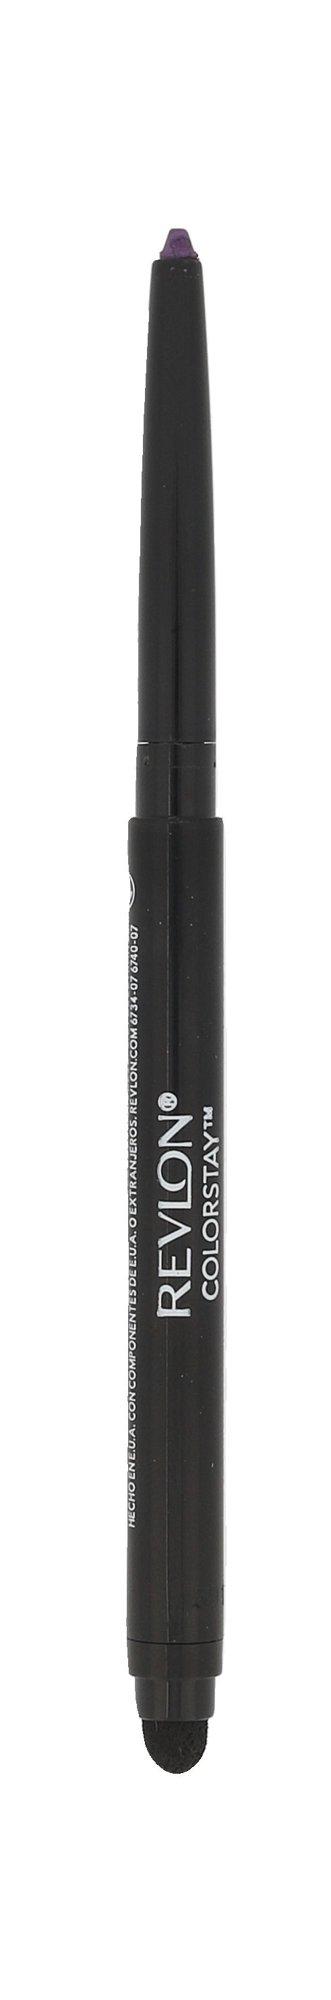 Revlon Colorstay Cosmetic 0,28ml Amethyst